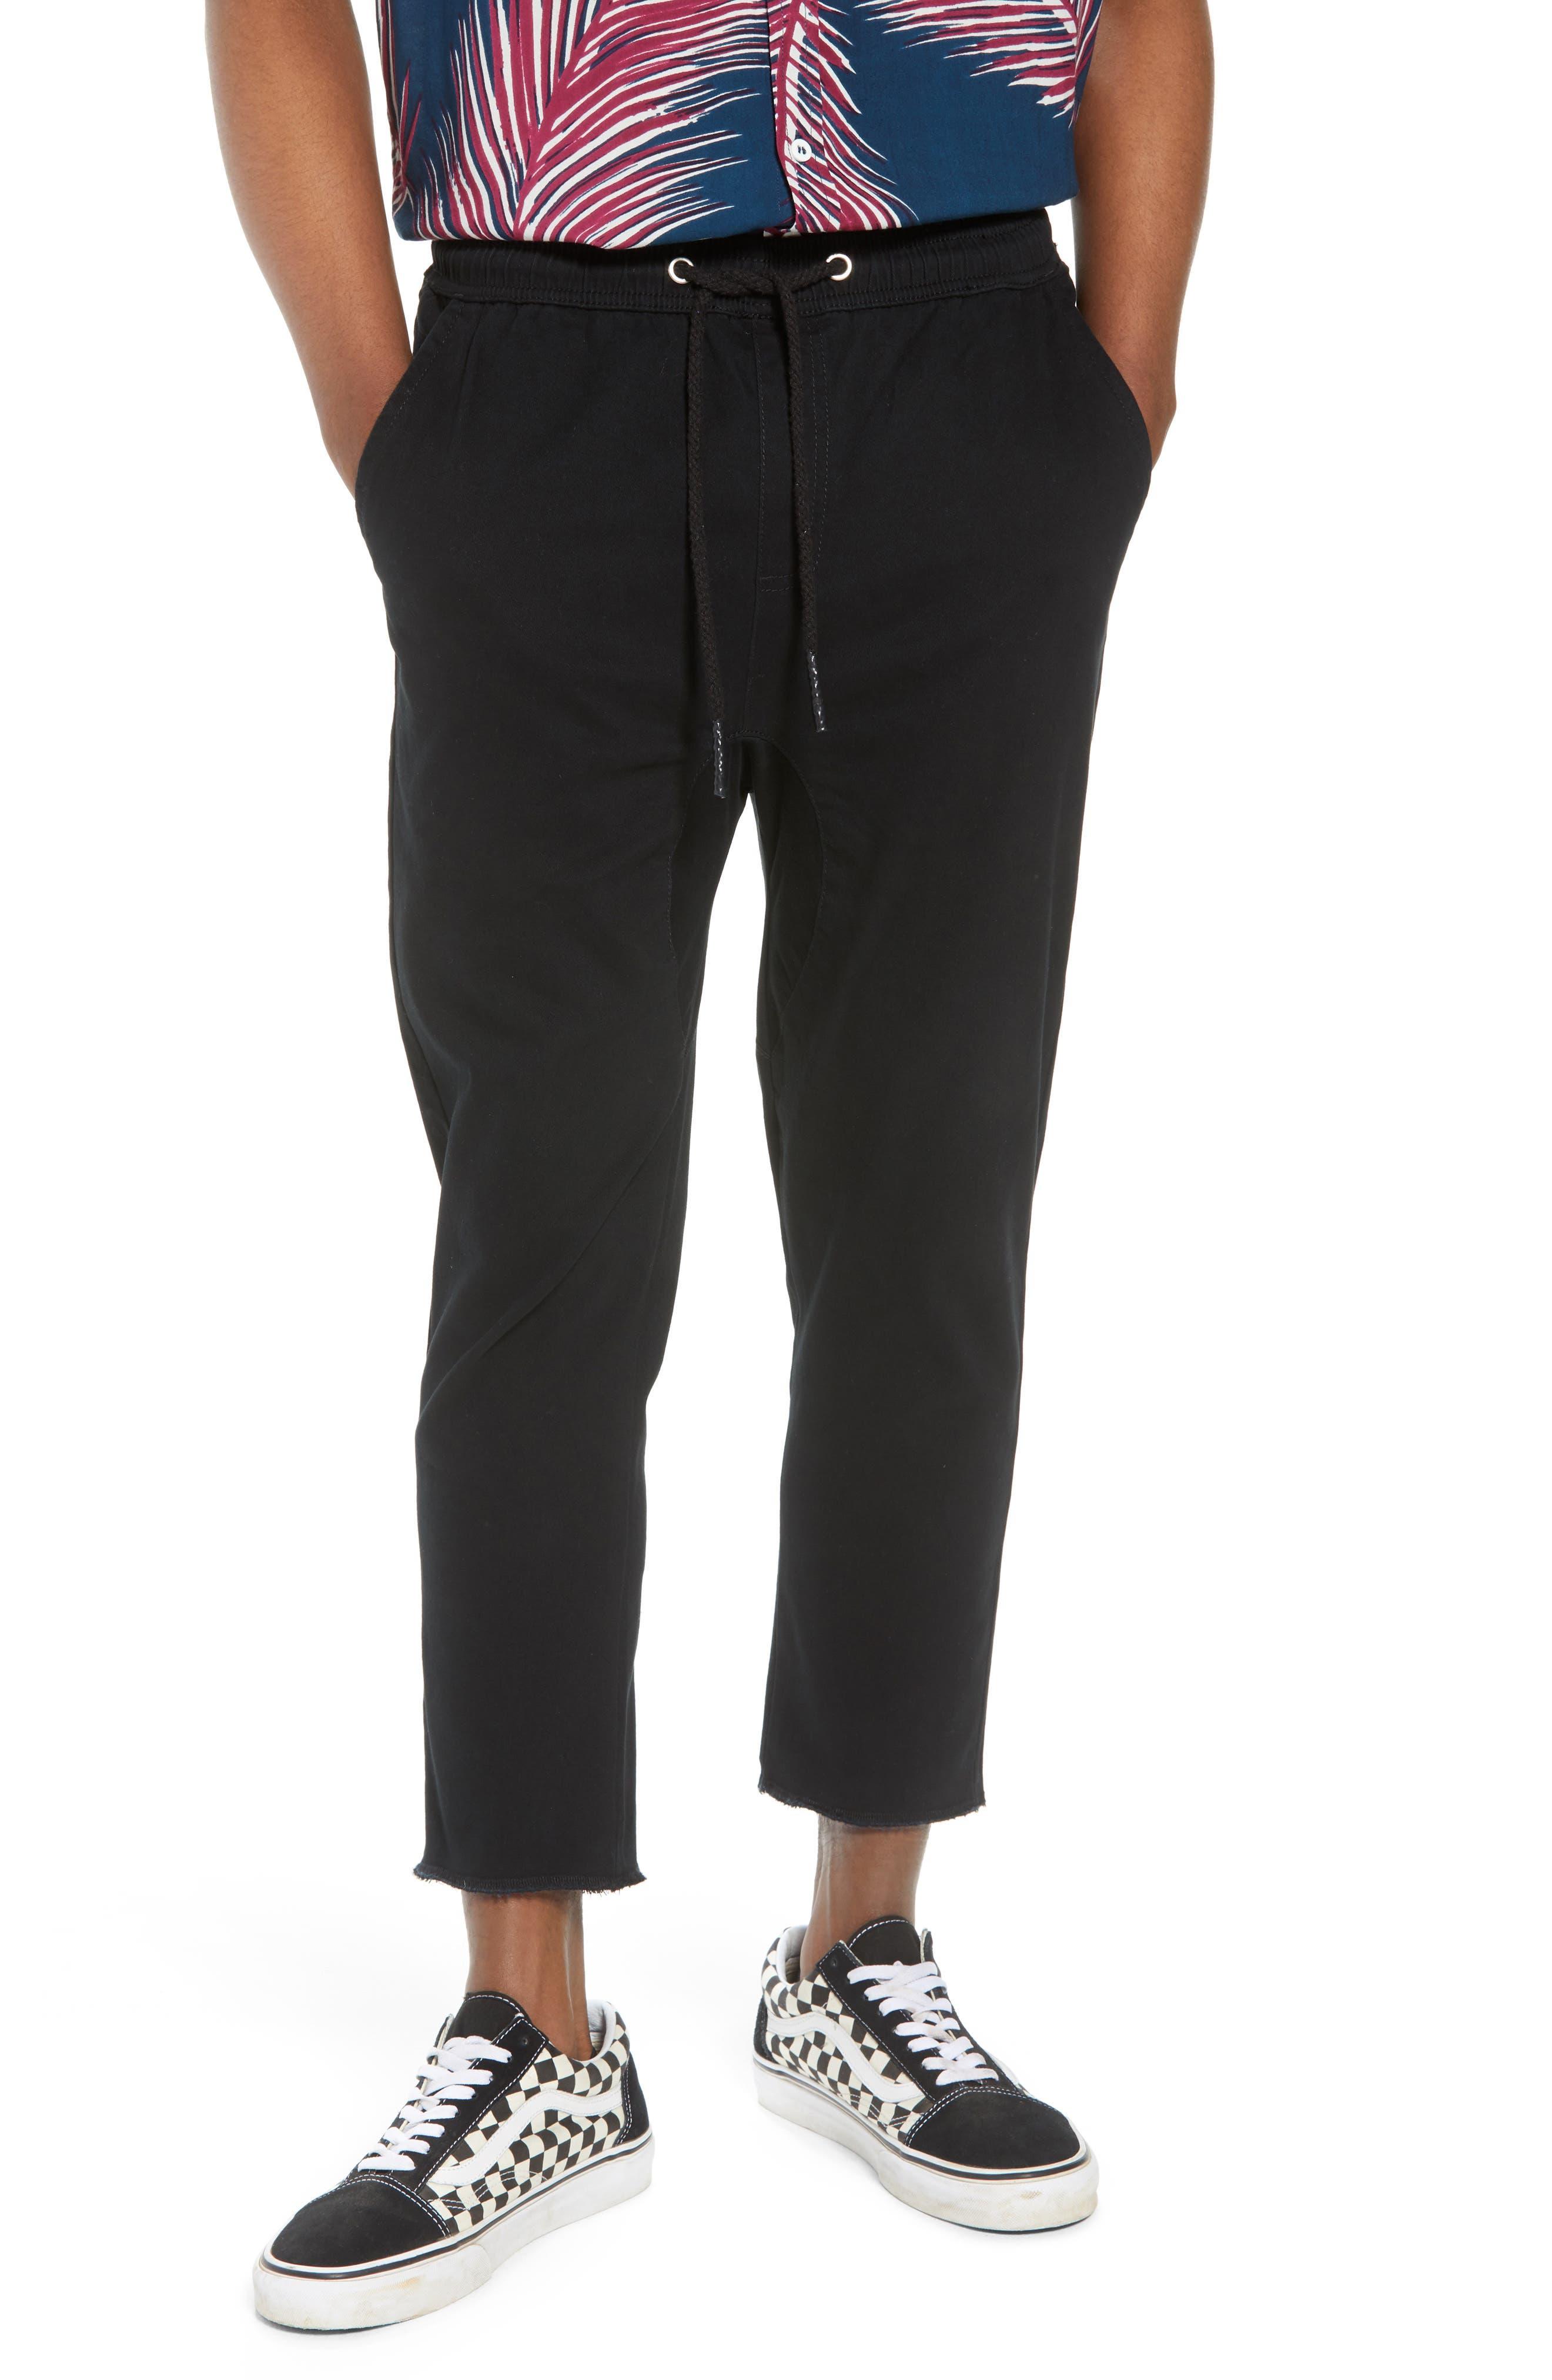 Vacation Slim Fit Crop Pants,                             Main thumbnail 1, color,                             BLACK